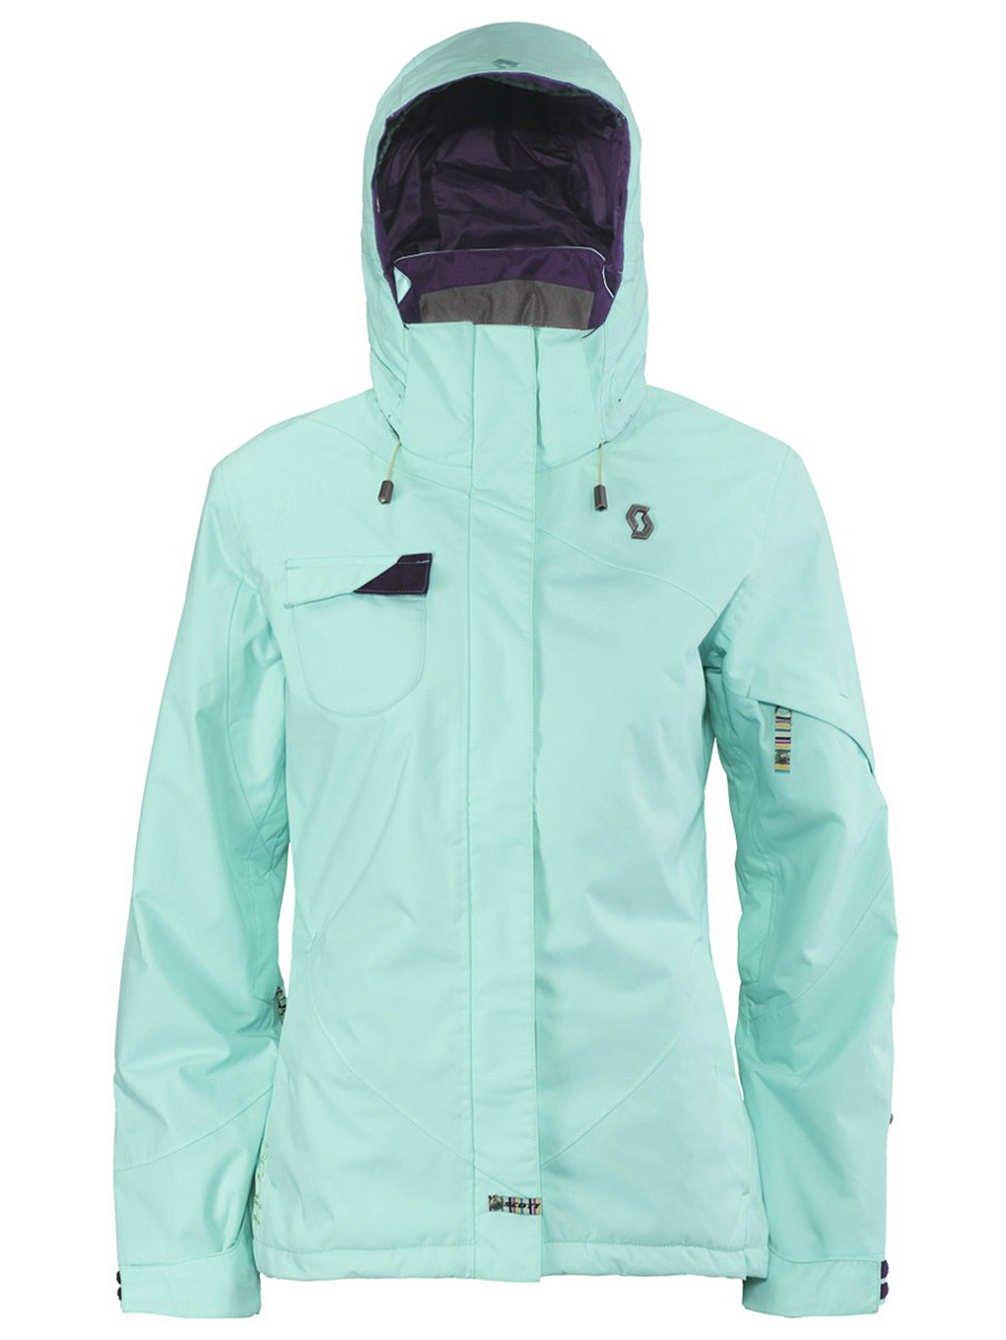 Damen Snowboard Jacke Scott Karisma Jacket jetzt bestellen